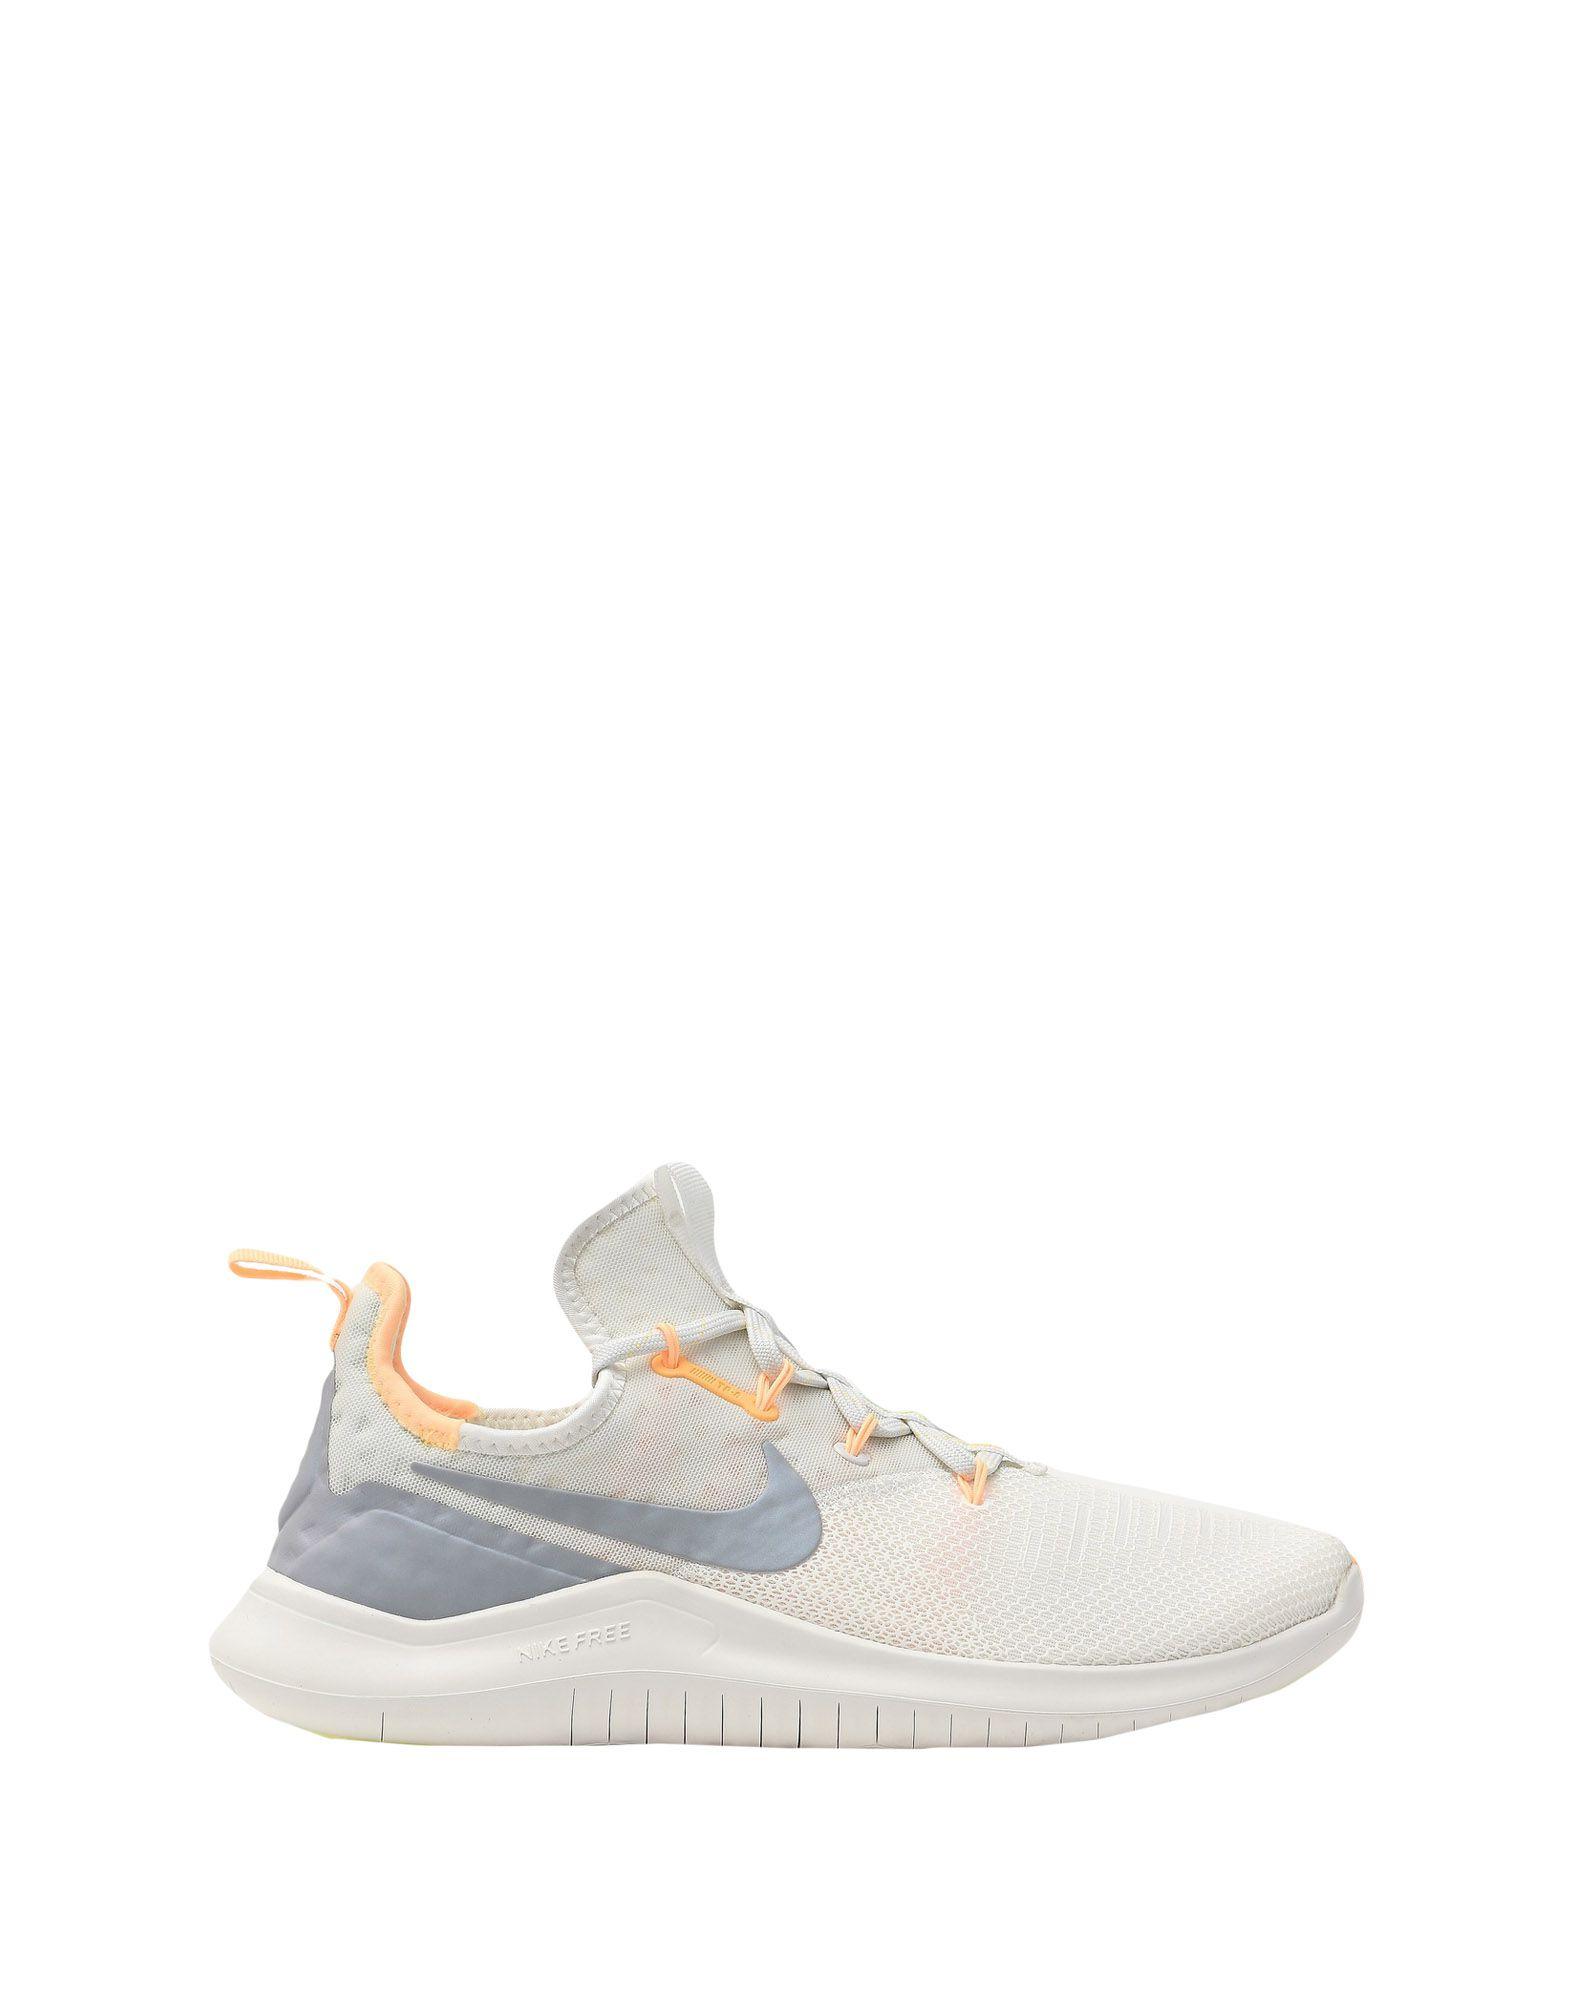 5c4c5dbbd32fb ... Nike Free Tr 8 Rise - Sneakers - - - Women Nike Sneakers online on  United ...